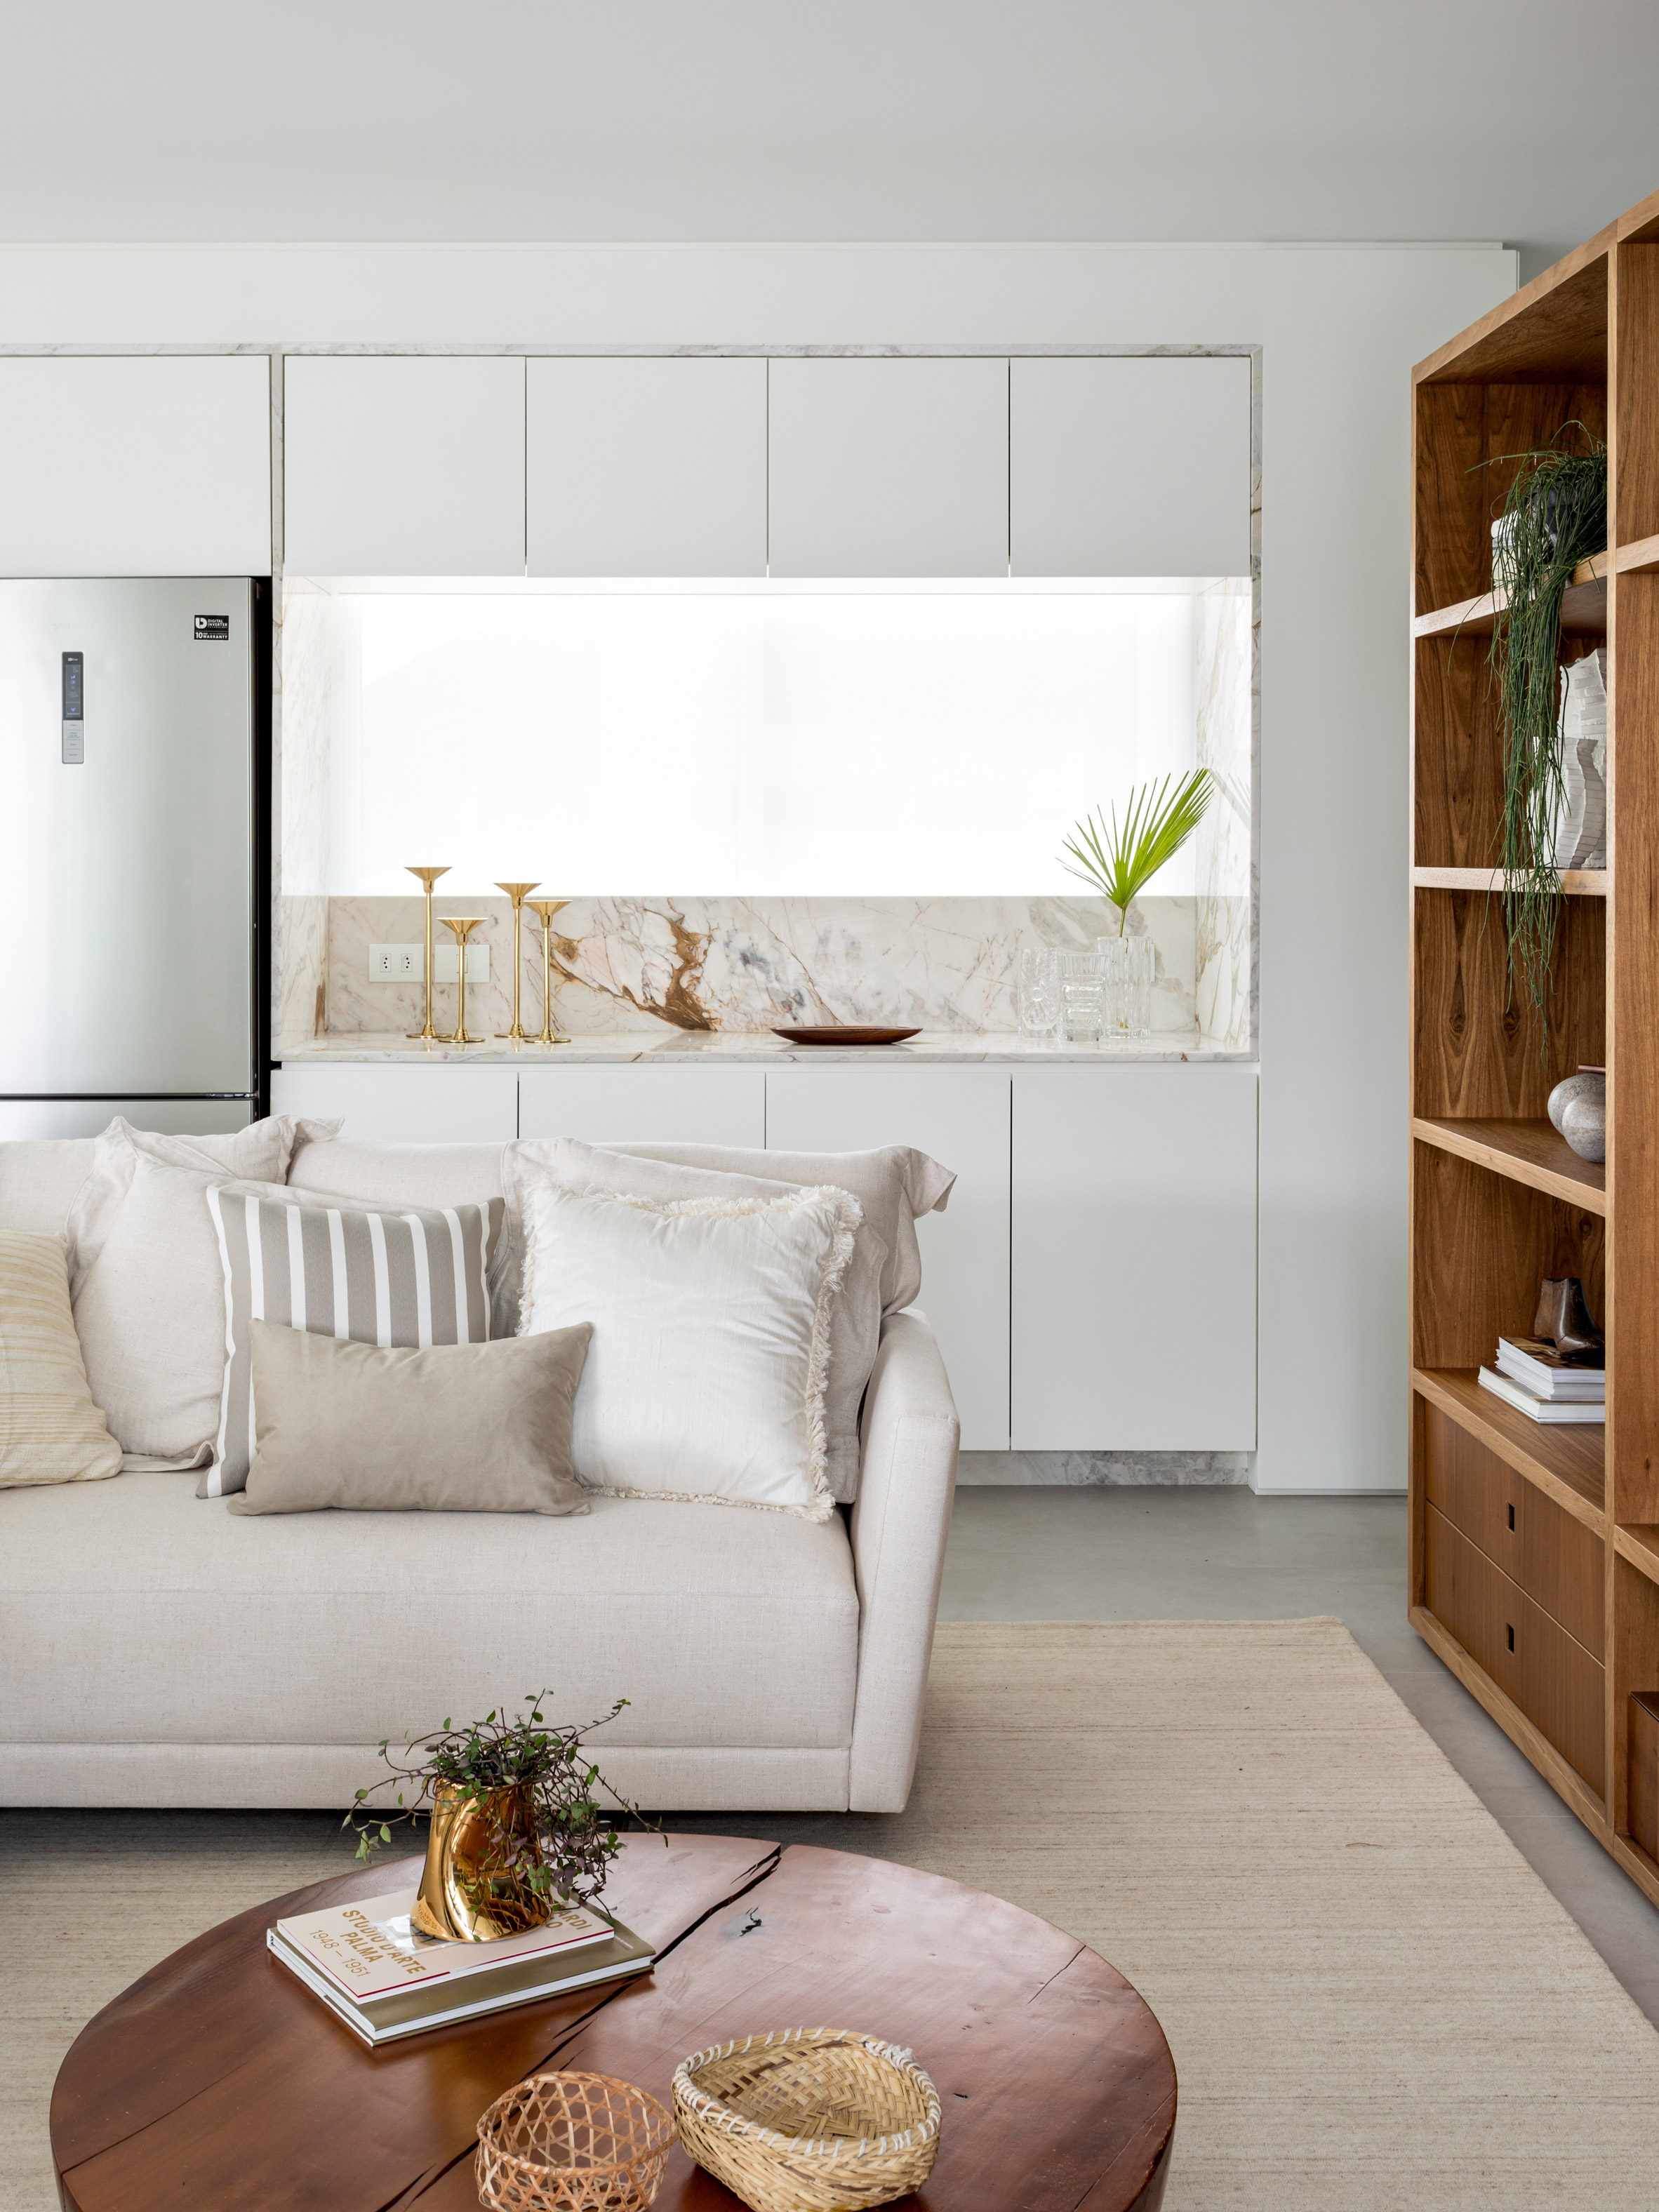 praia mansa apartment leandro garcia interiors brazil dezeen 2364 col 2 1